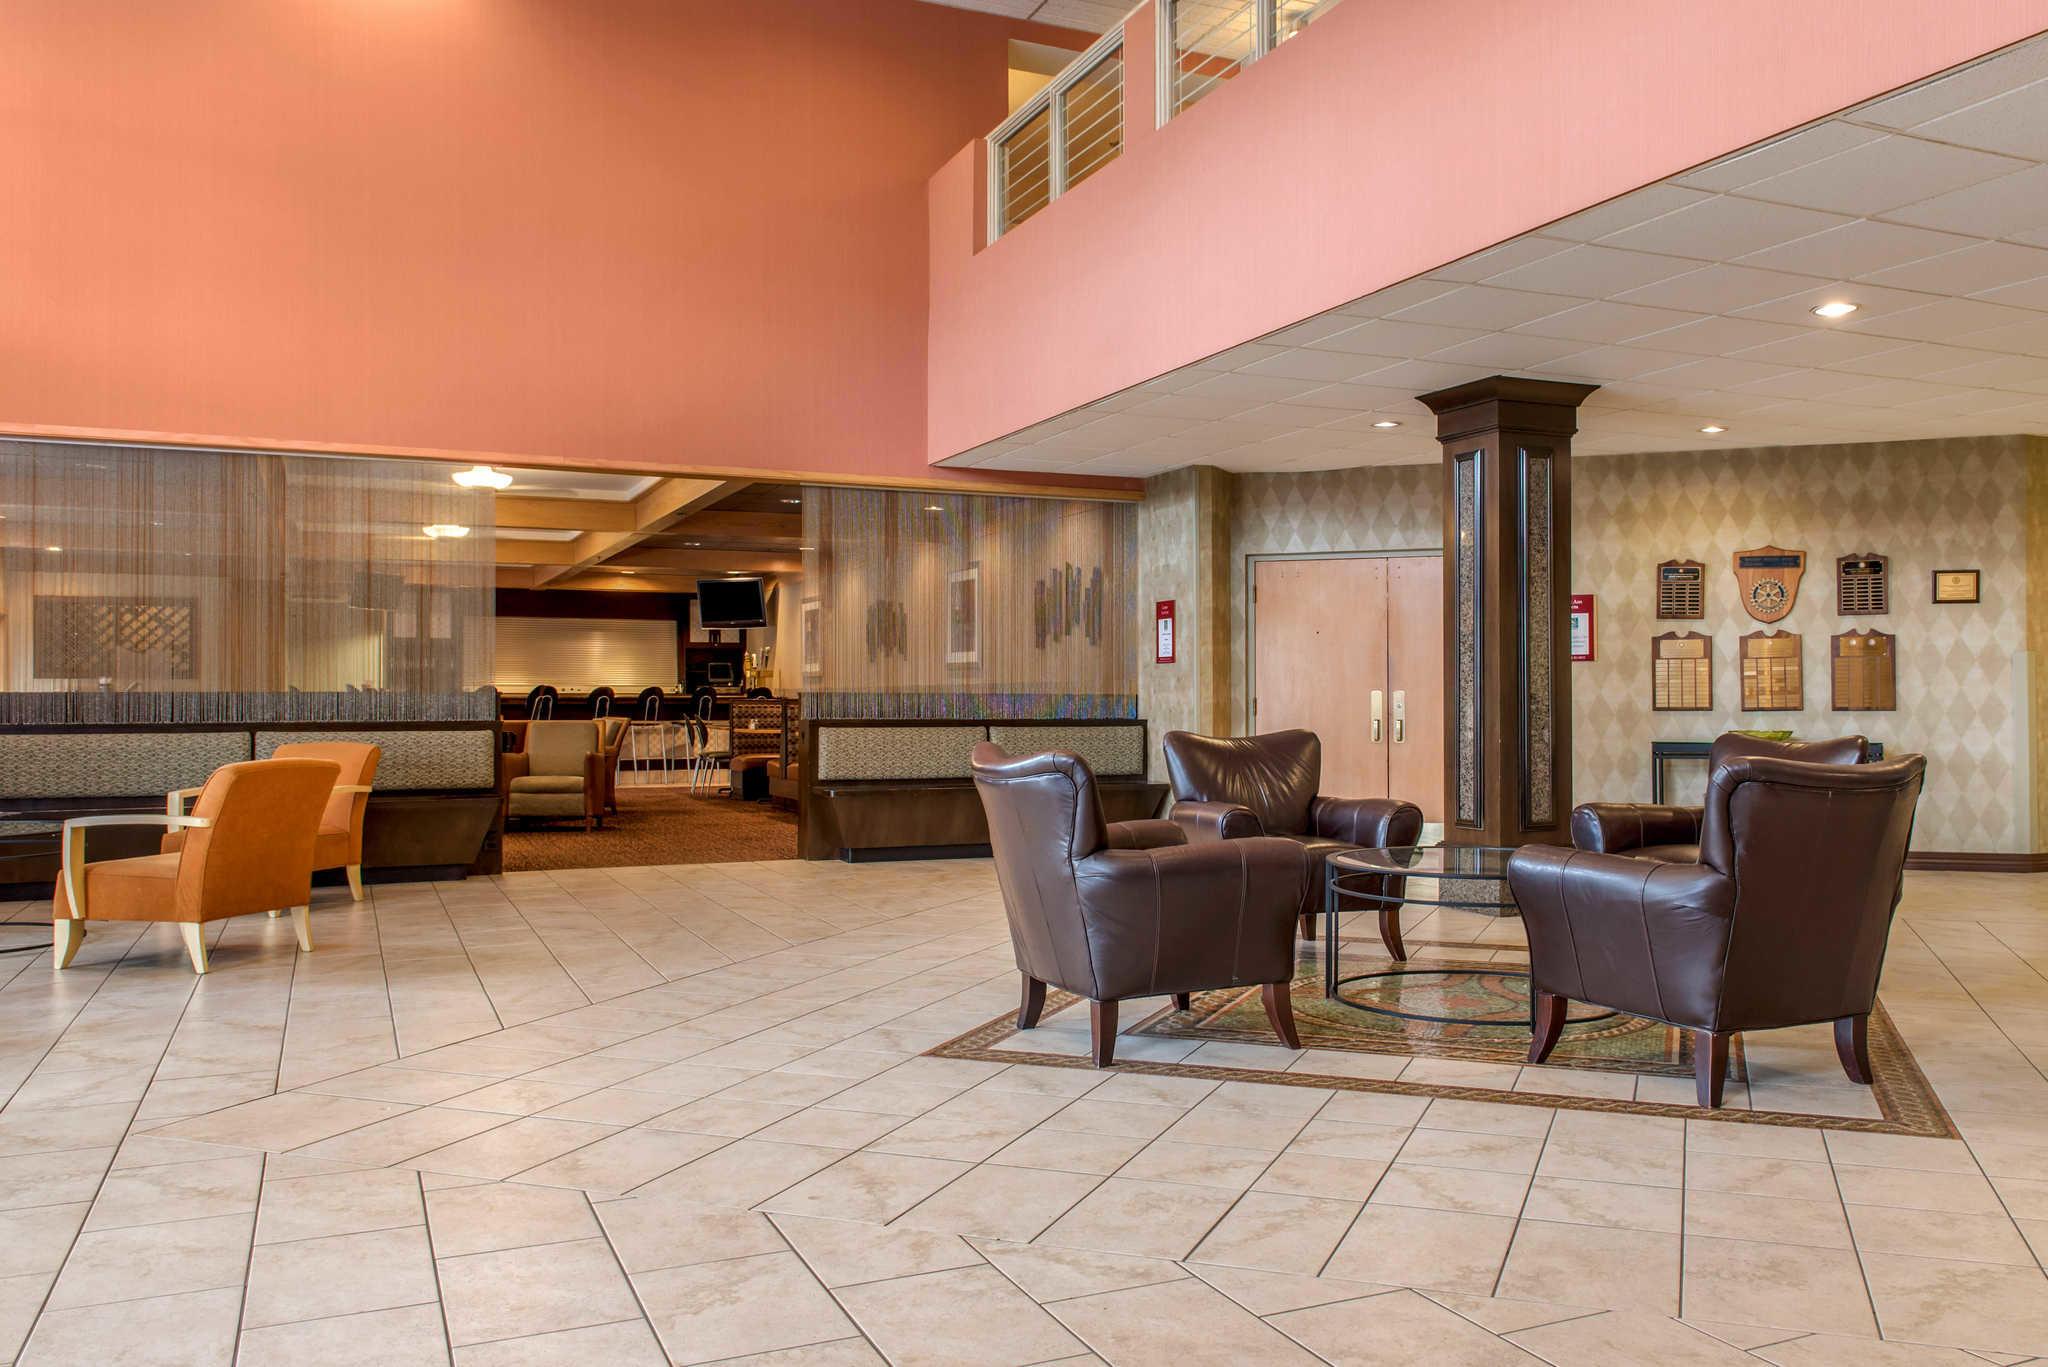 Quality Hotel - Cincinnati Blue Ash image 4